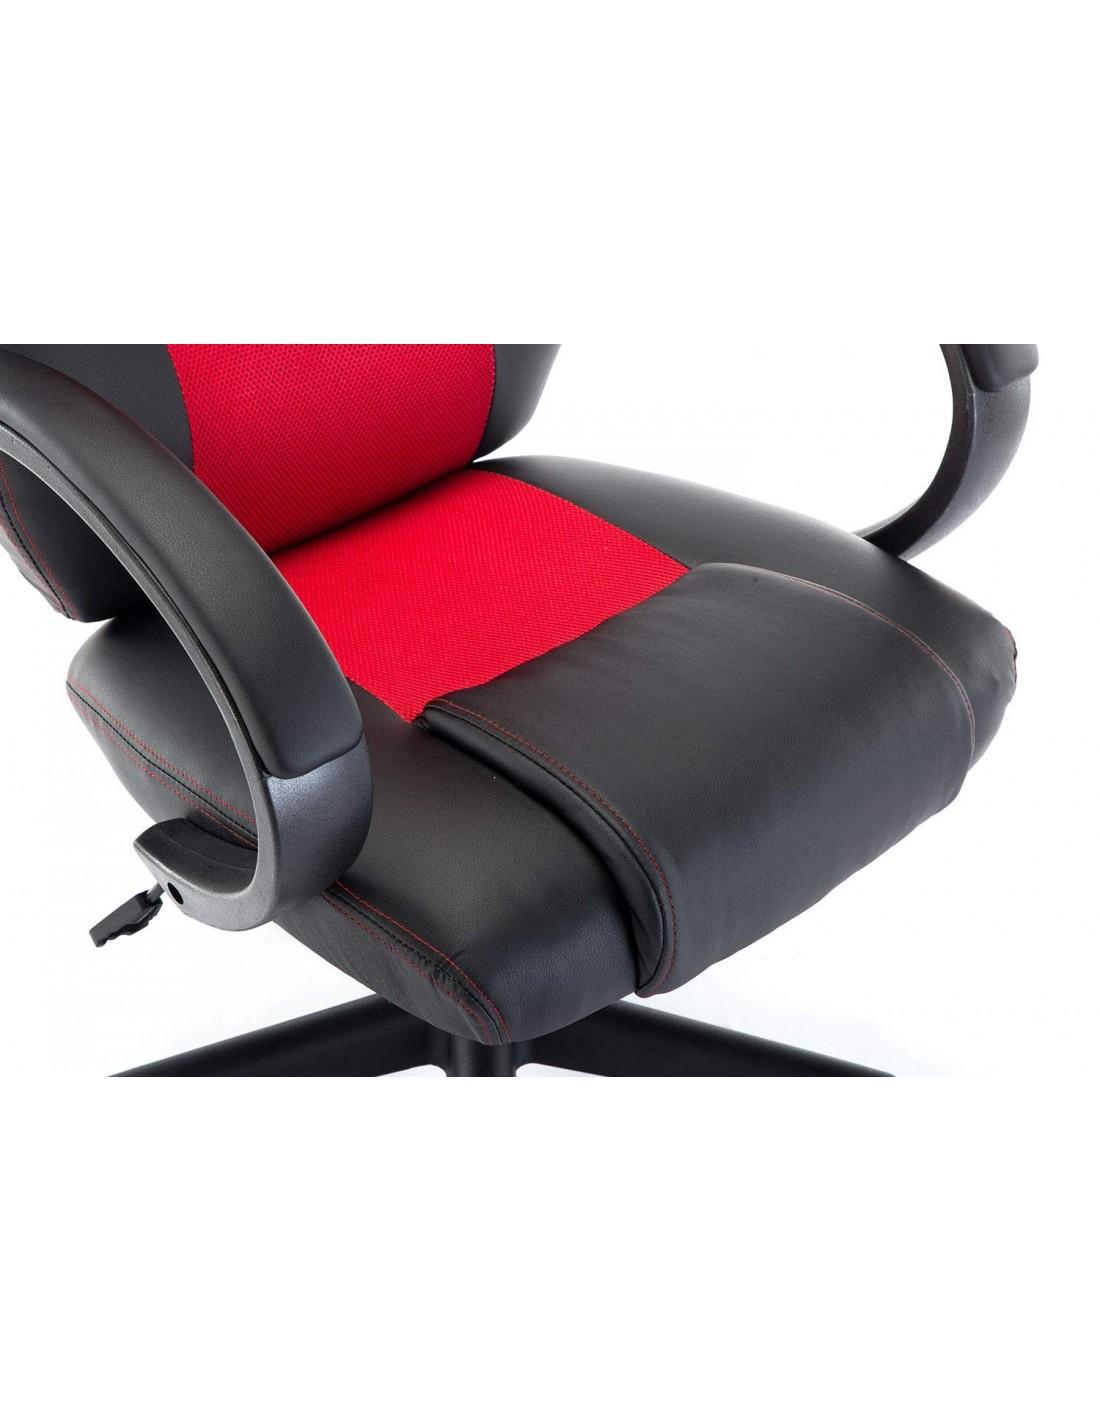 Poltrona Design Rossa - Badezimmer Deko